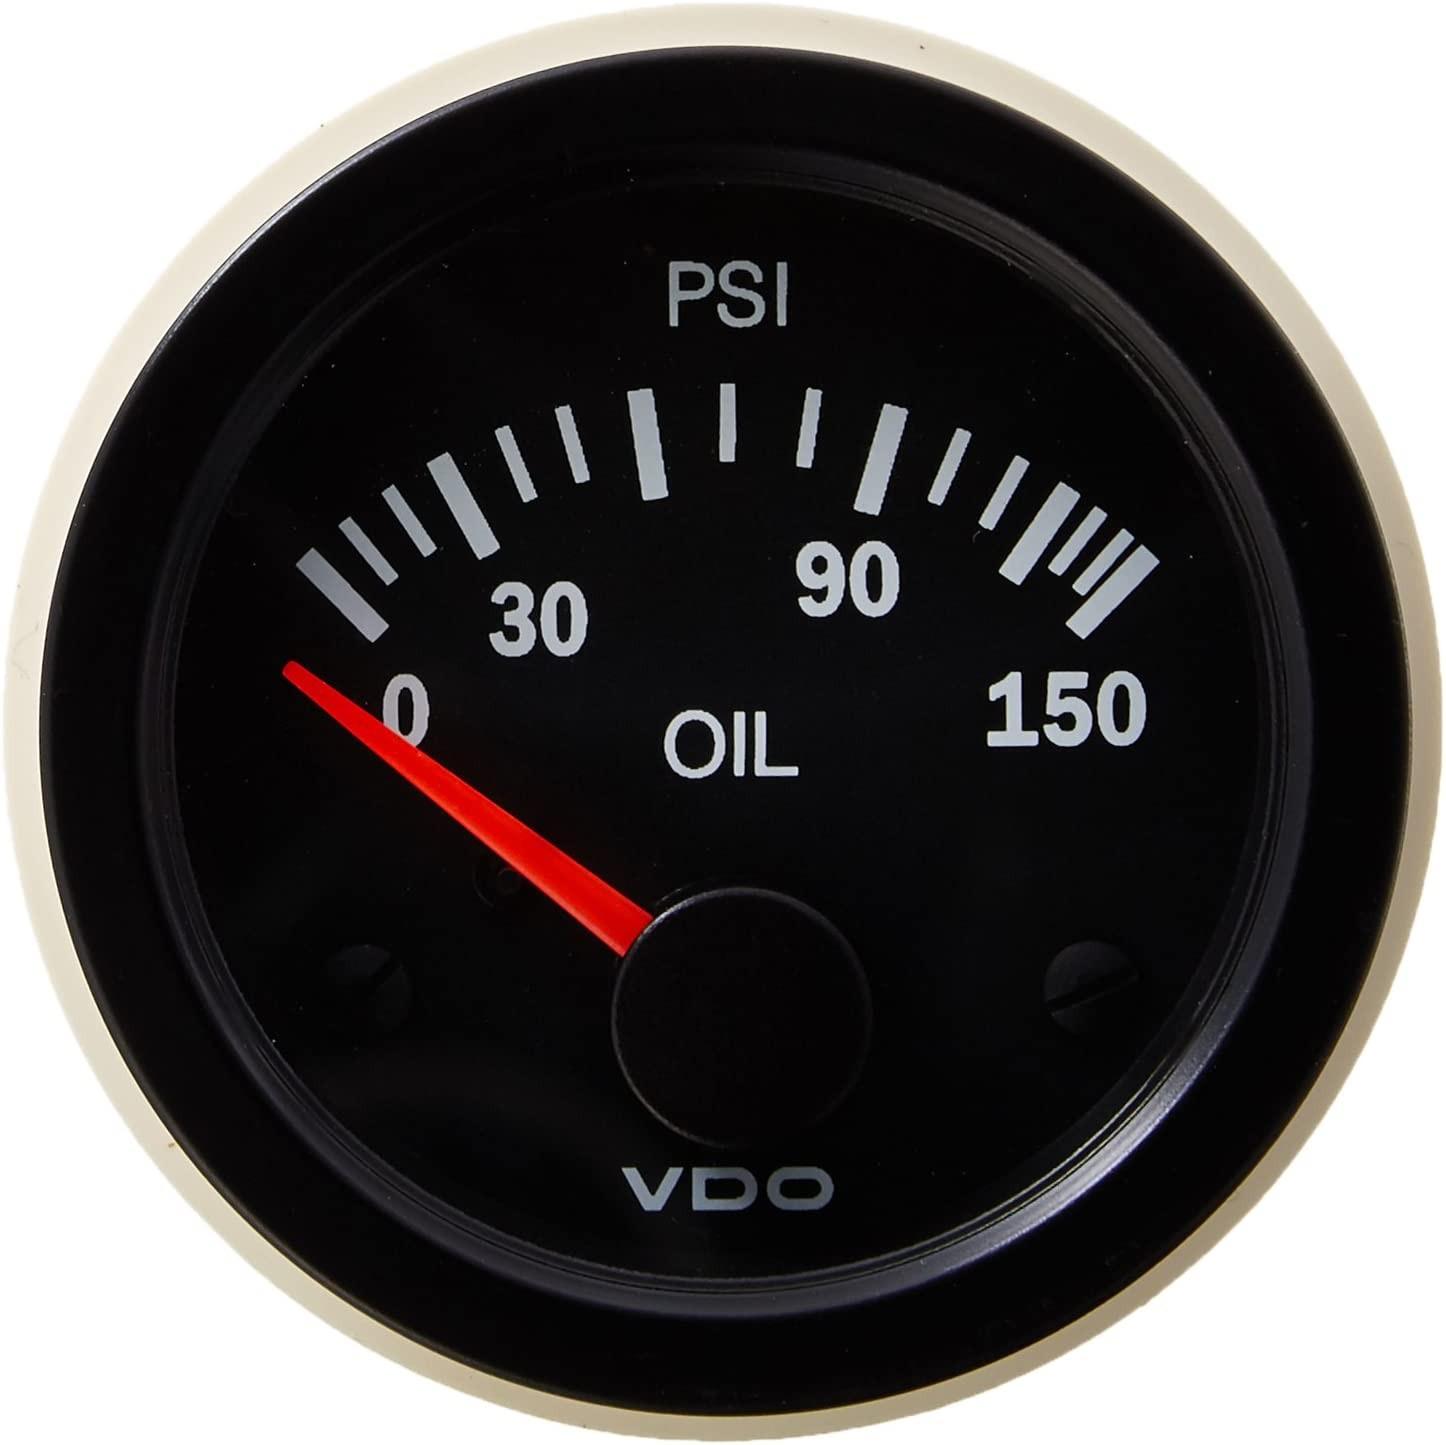 Vdo Oil Pressure Gauge Wiring Amazon Vdo 350 108 Oil Pressure Gauge Automotive Of Vdo Oil Pressure Gauge Wiring